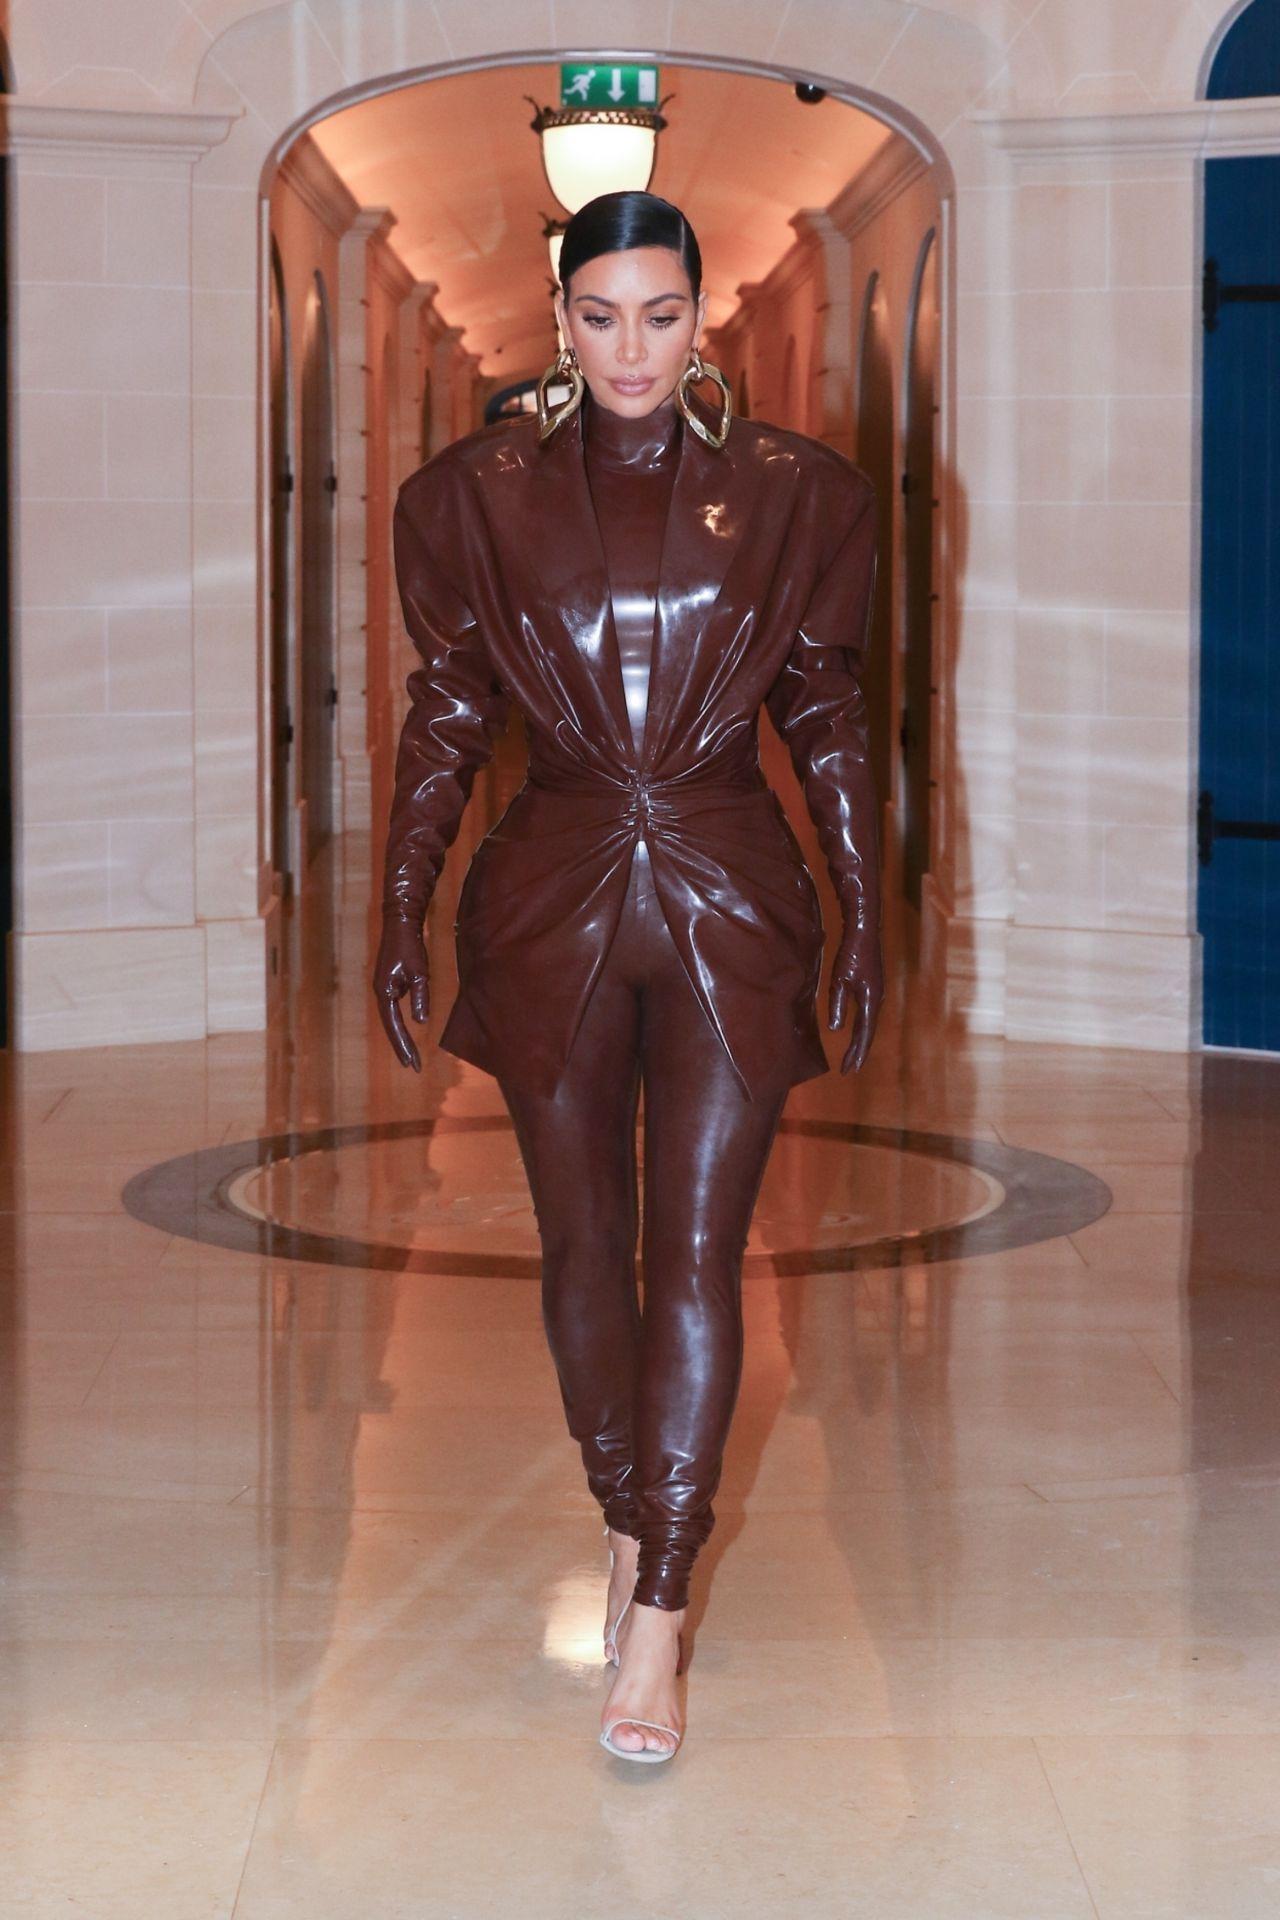 kim-kardashian-in-balmain-fw20-latex-outfit-paris-03-01-2020-0